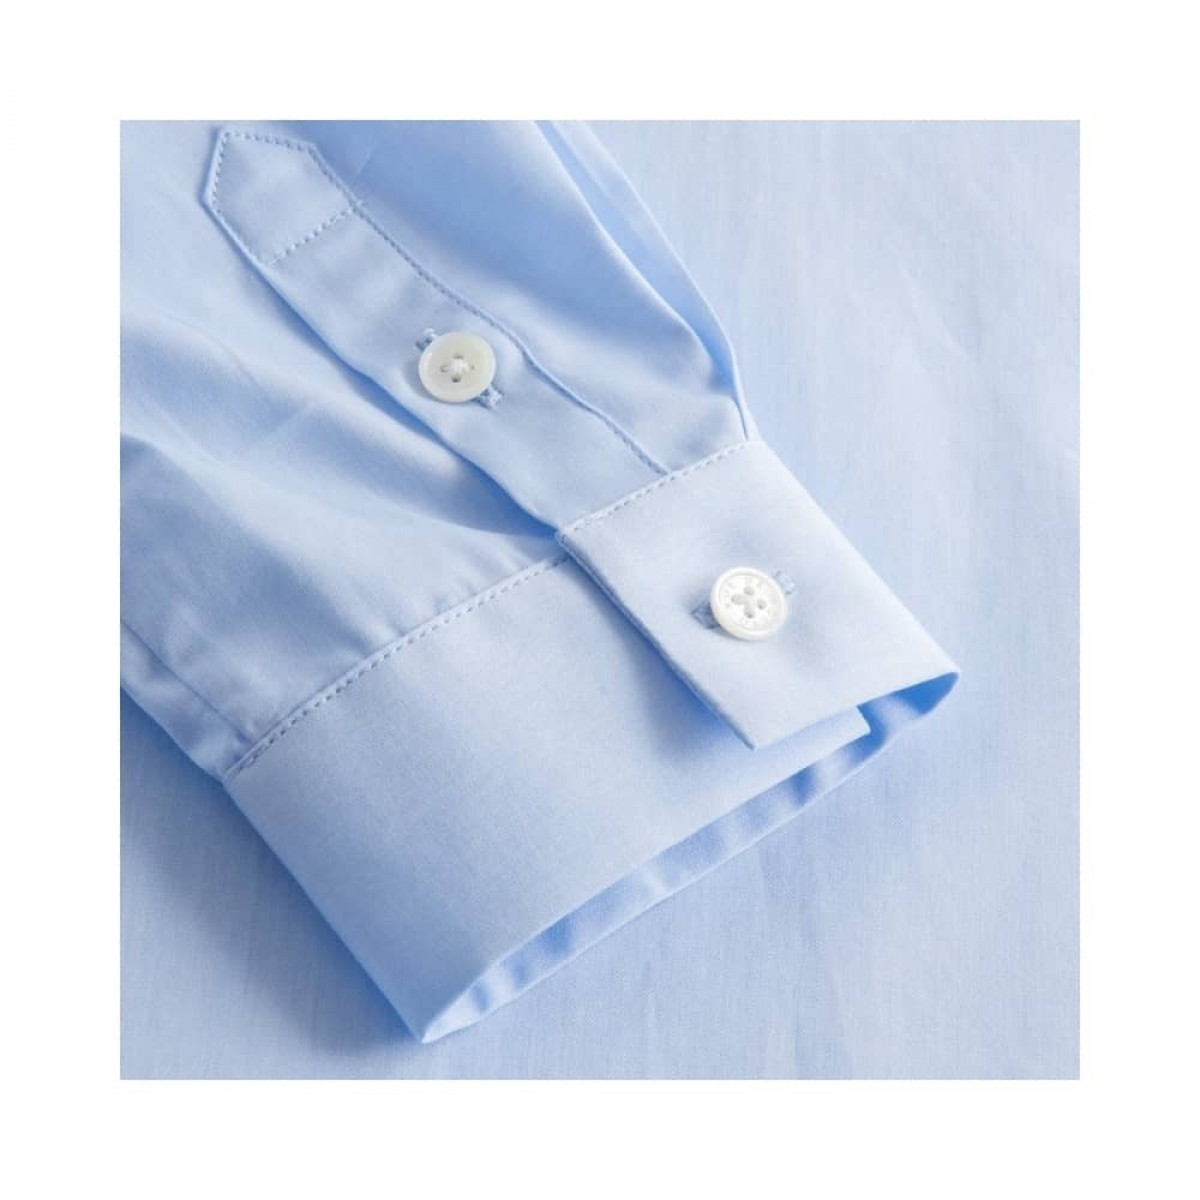 sera skjorte - light blue - ærme detalje